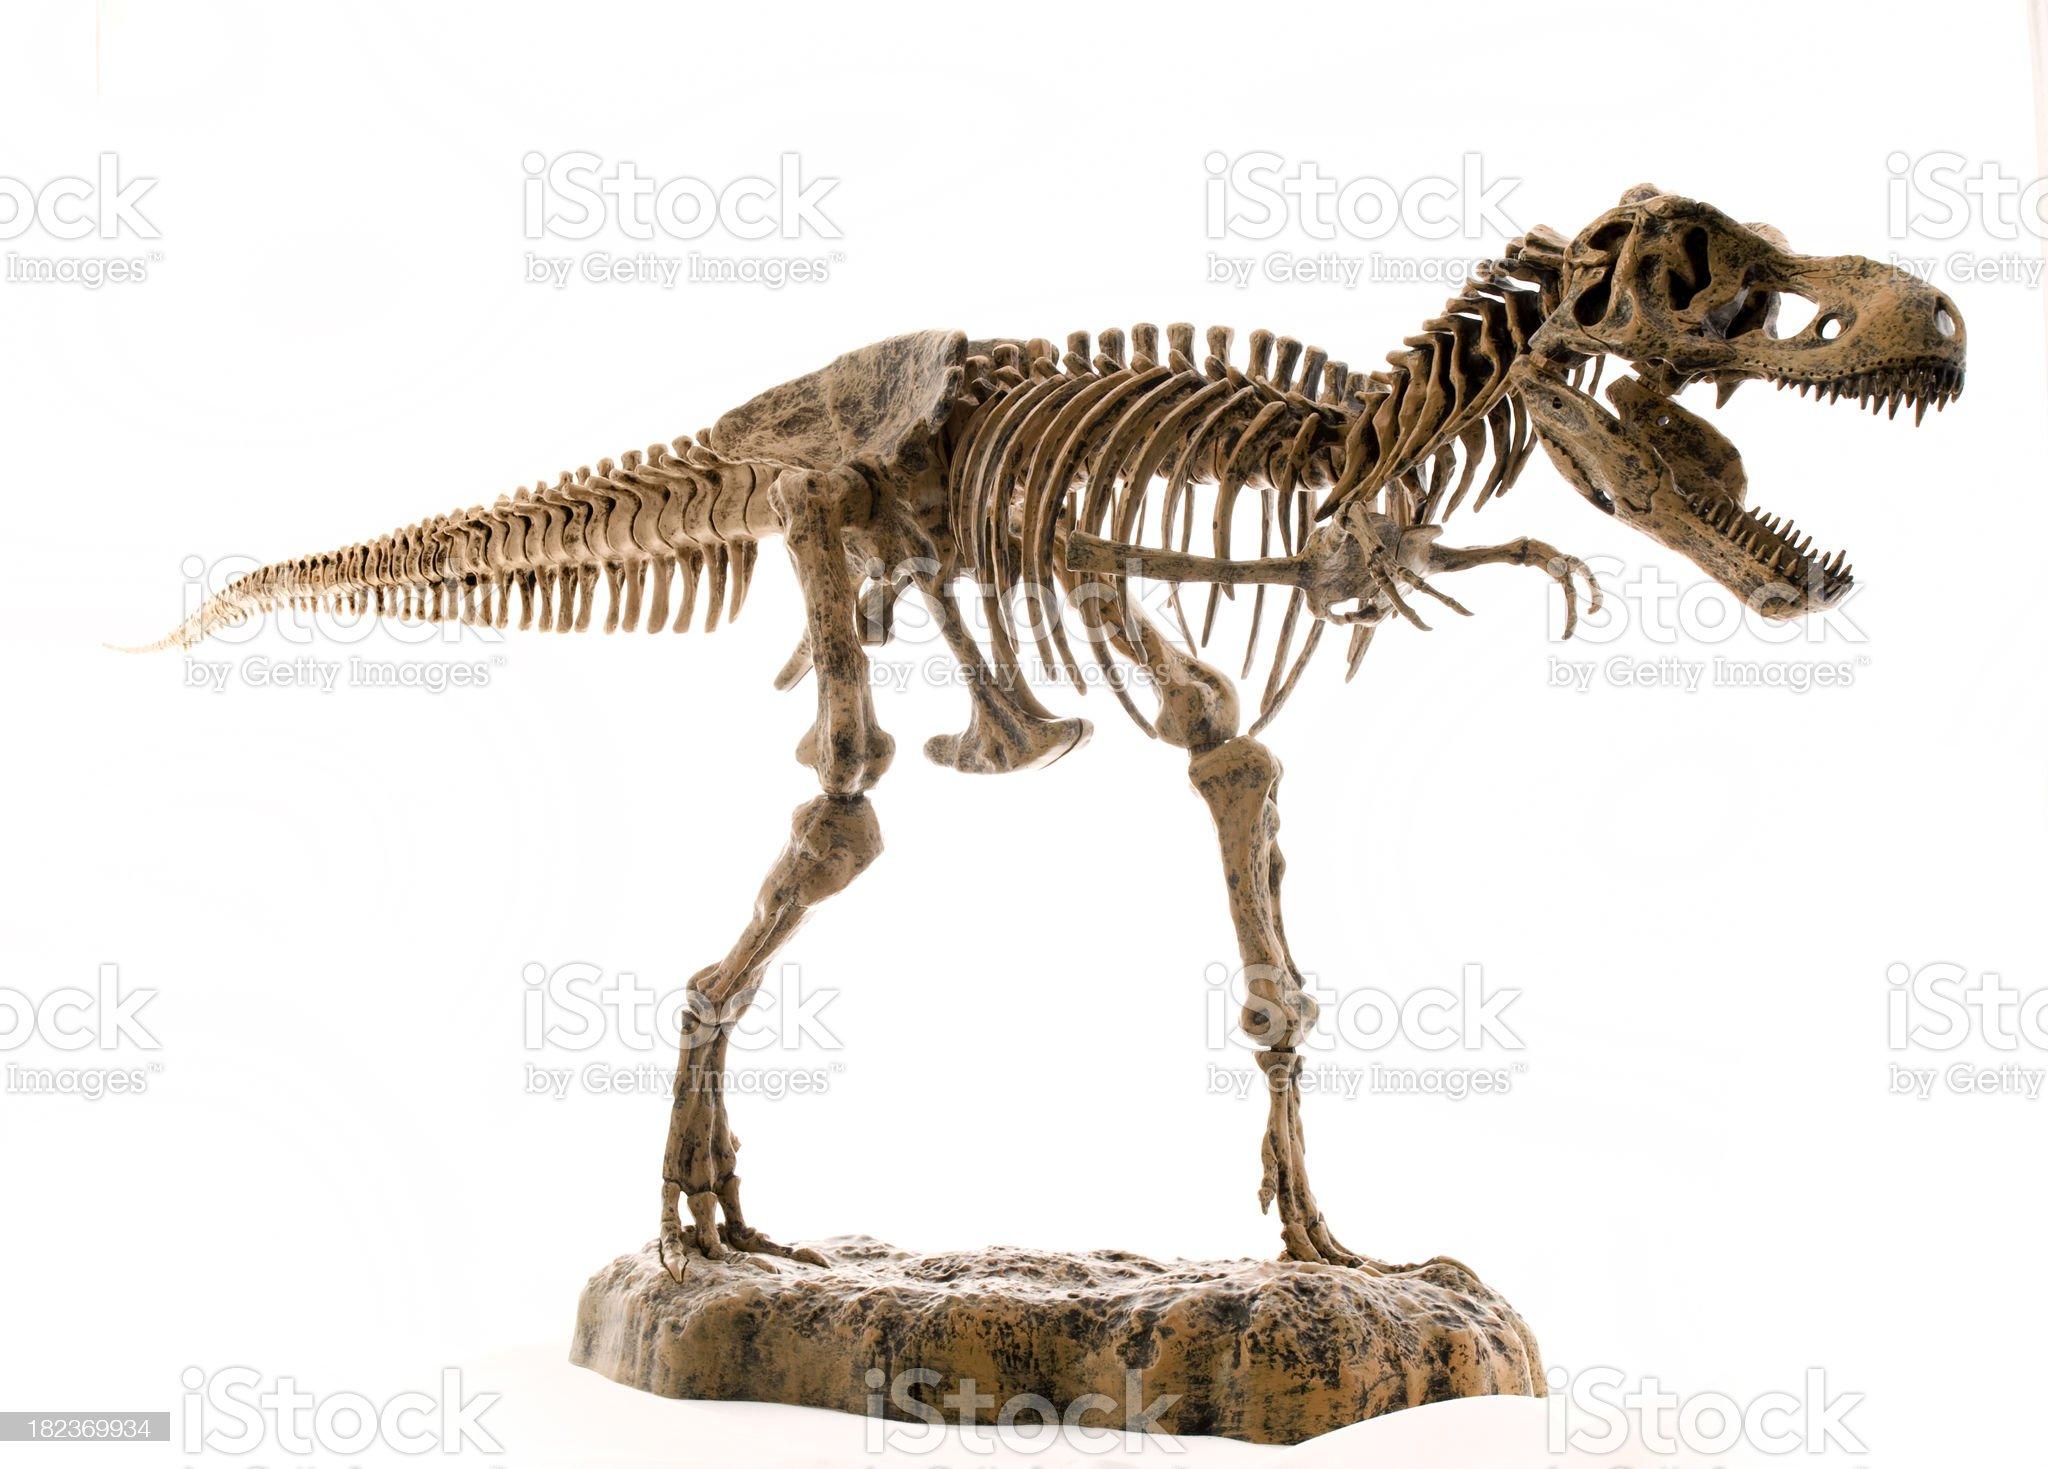 tyranosaurus rex skeleton, dinosaure squelette royalty-free stock photo